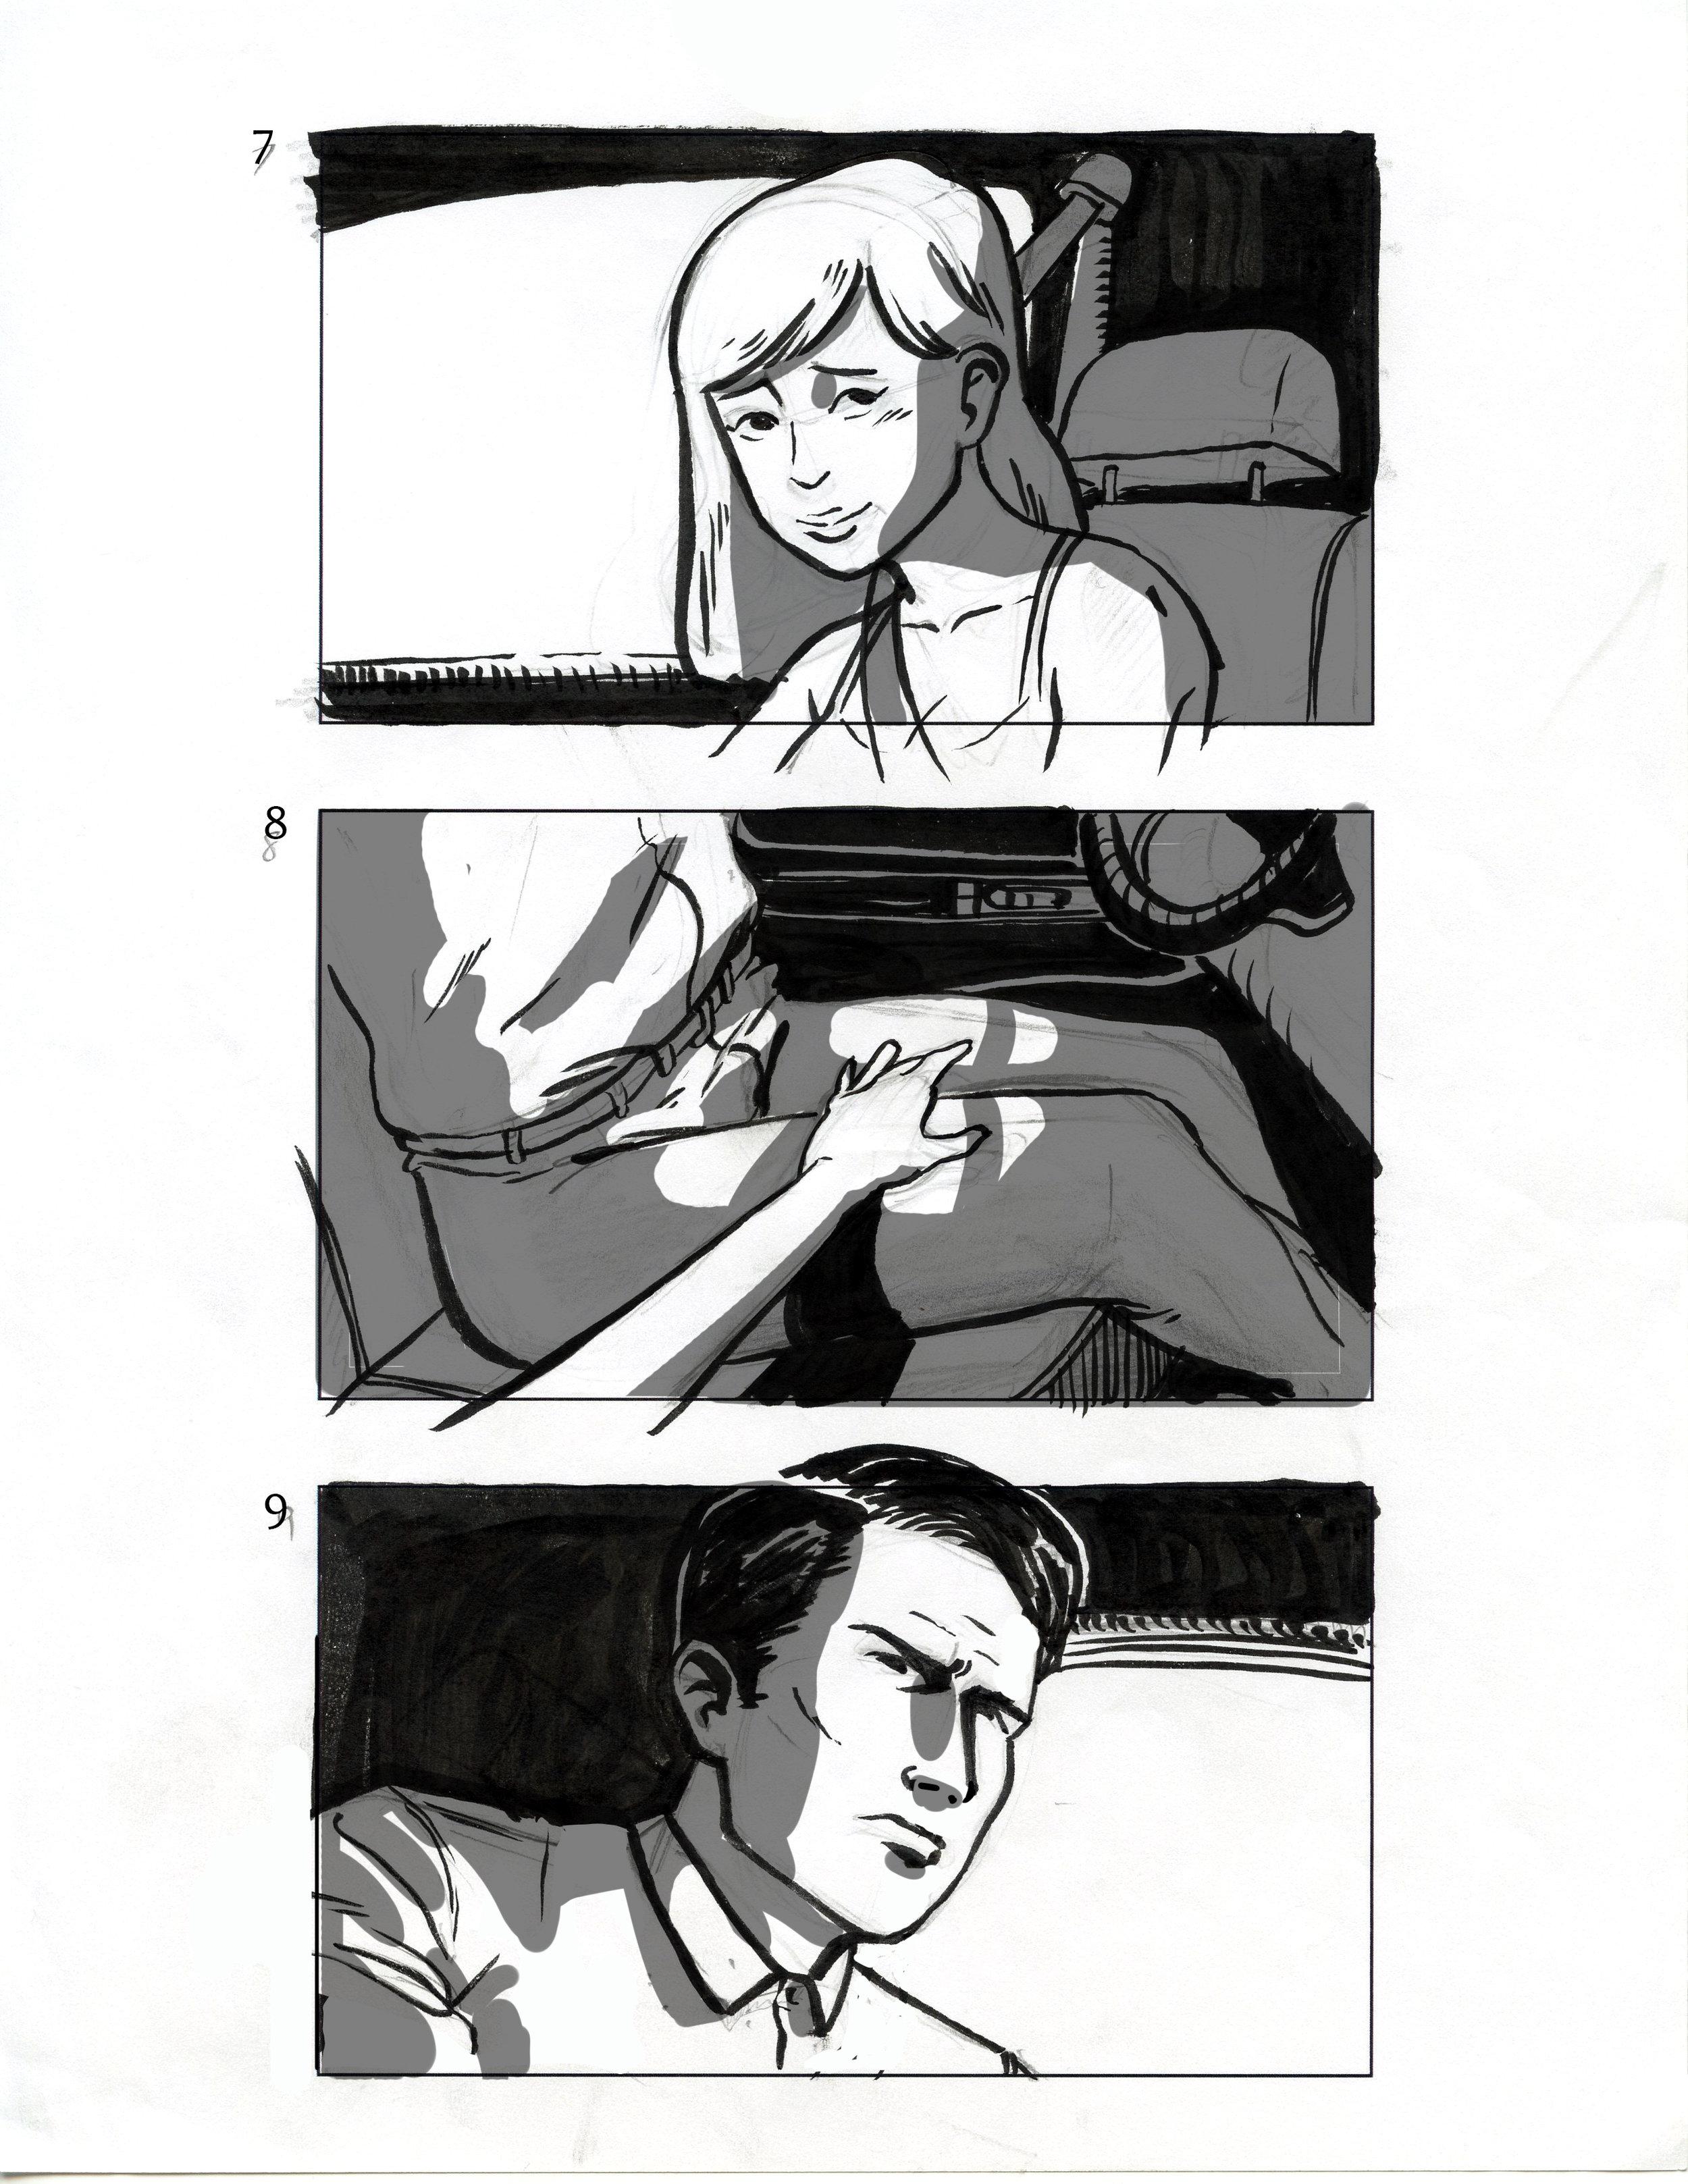 Storyboard1_7-9.jpg